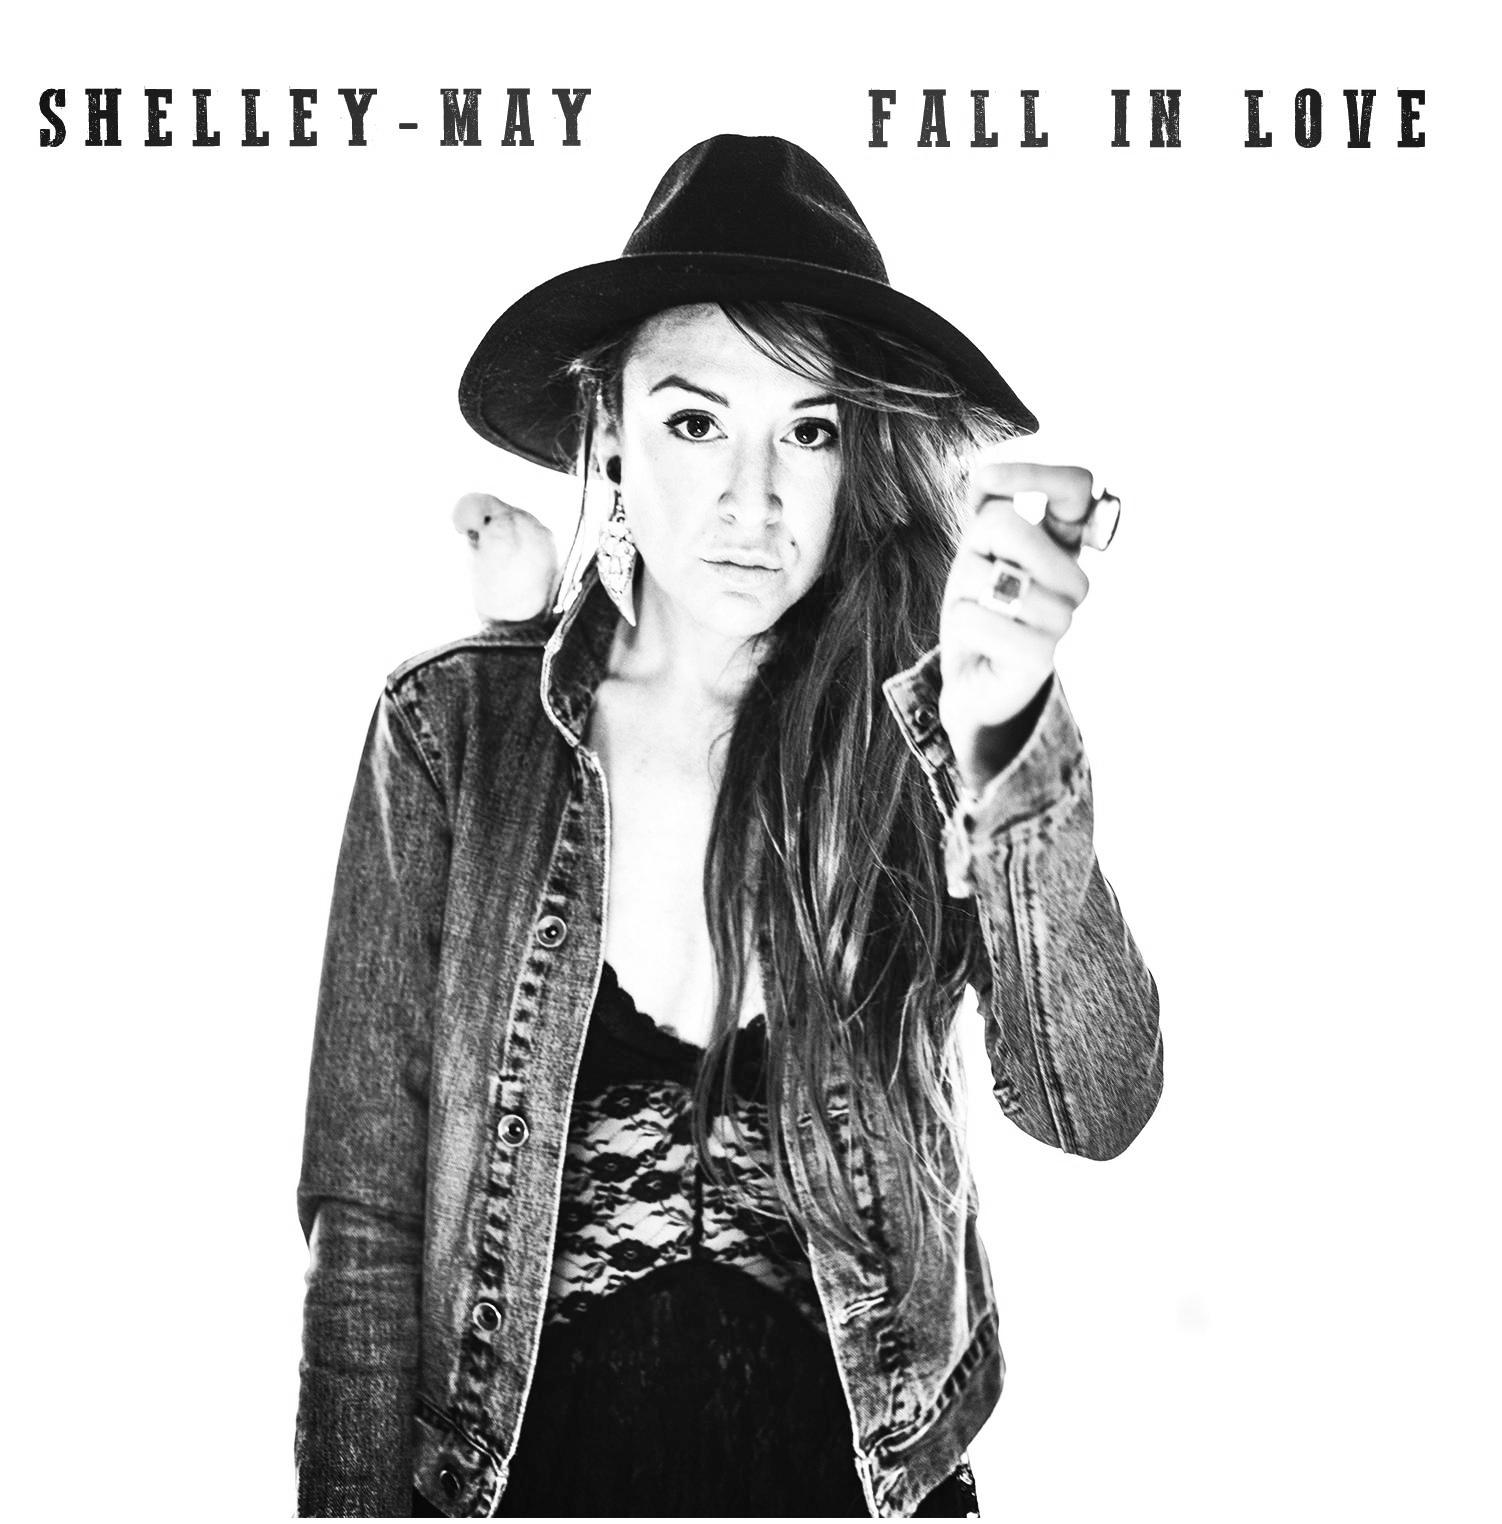 shelley_may_fall_in_love.jpg